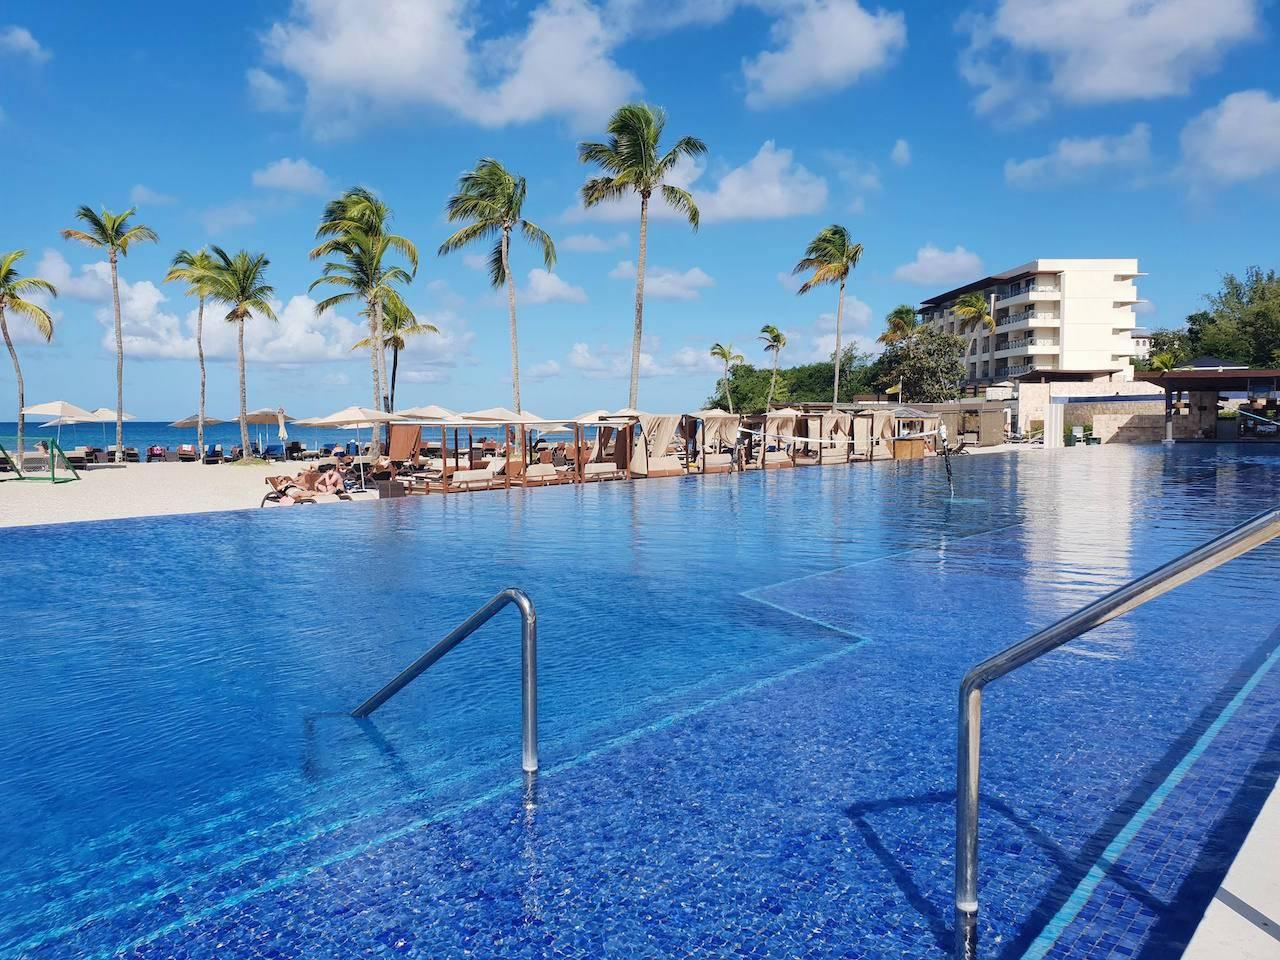 Royalton Saint Lucia resort review